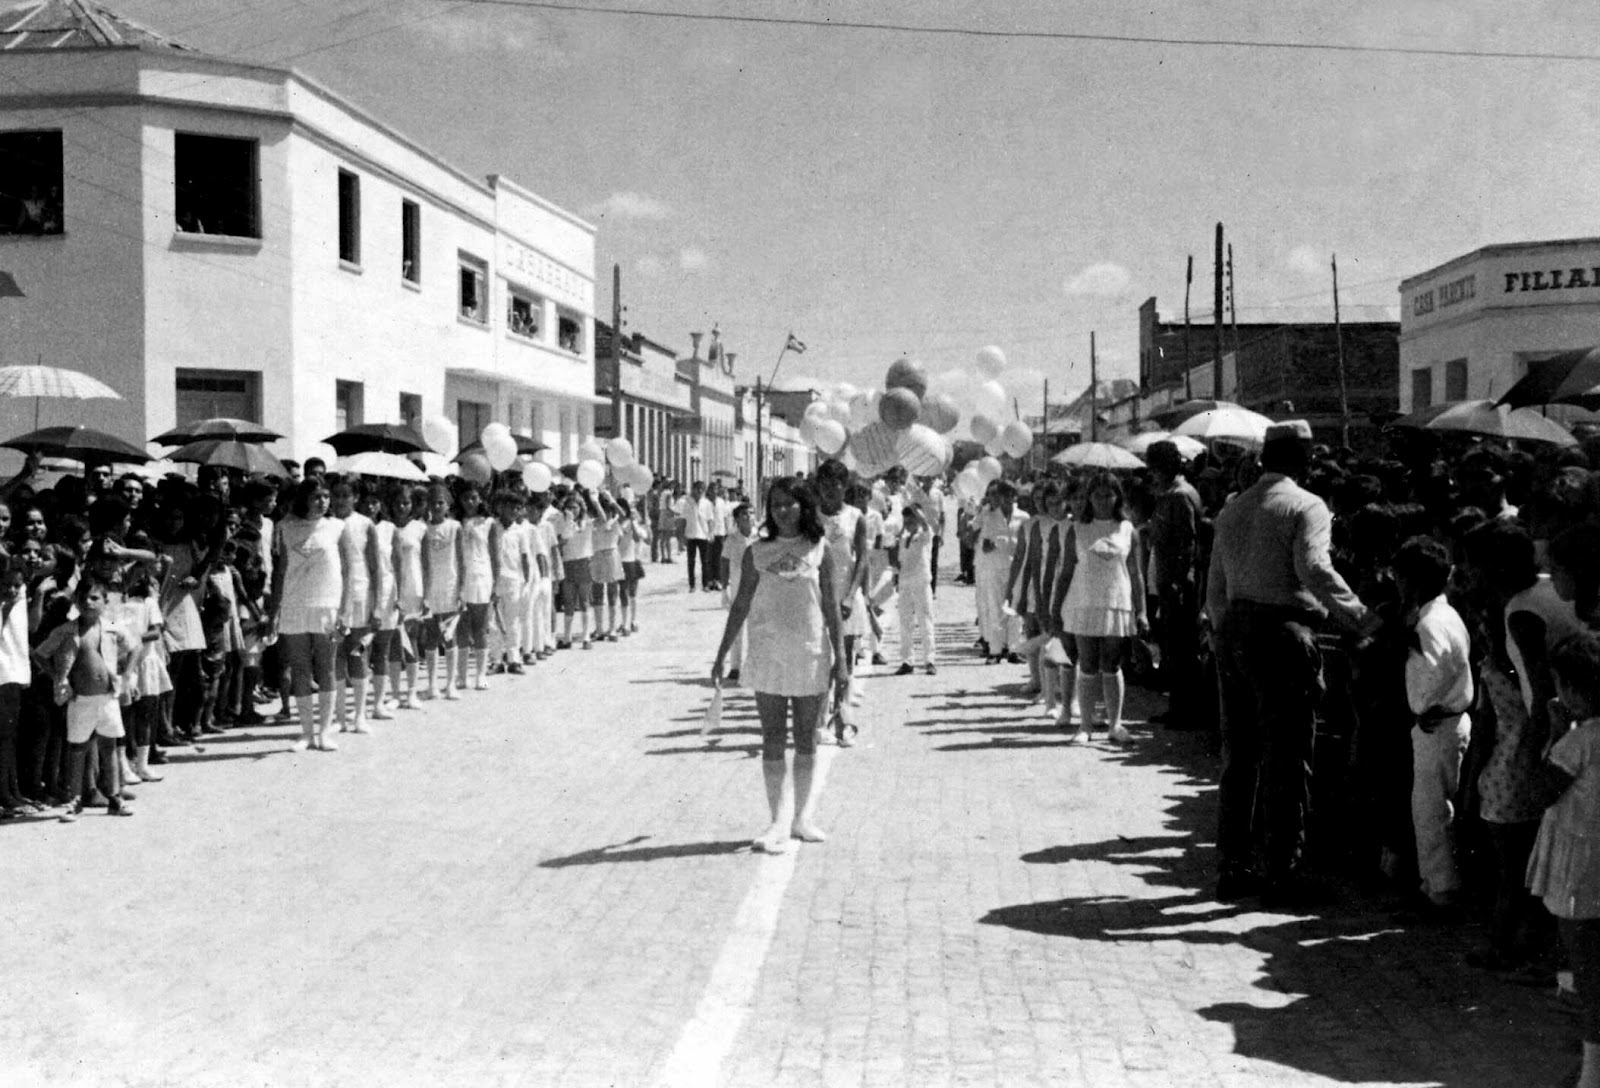 Sâmyk Farias: Fotos Antigas de Sena Madureira/Acre